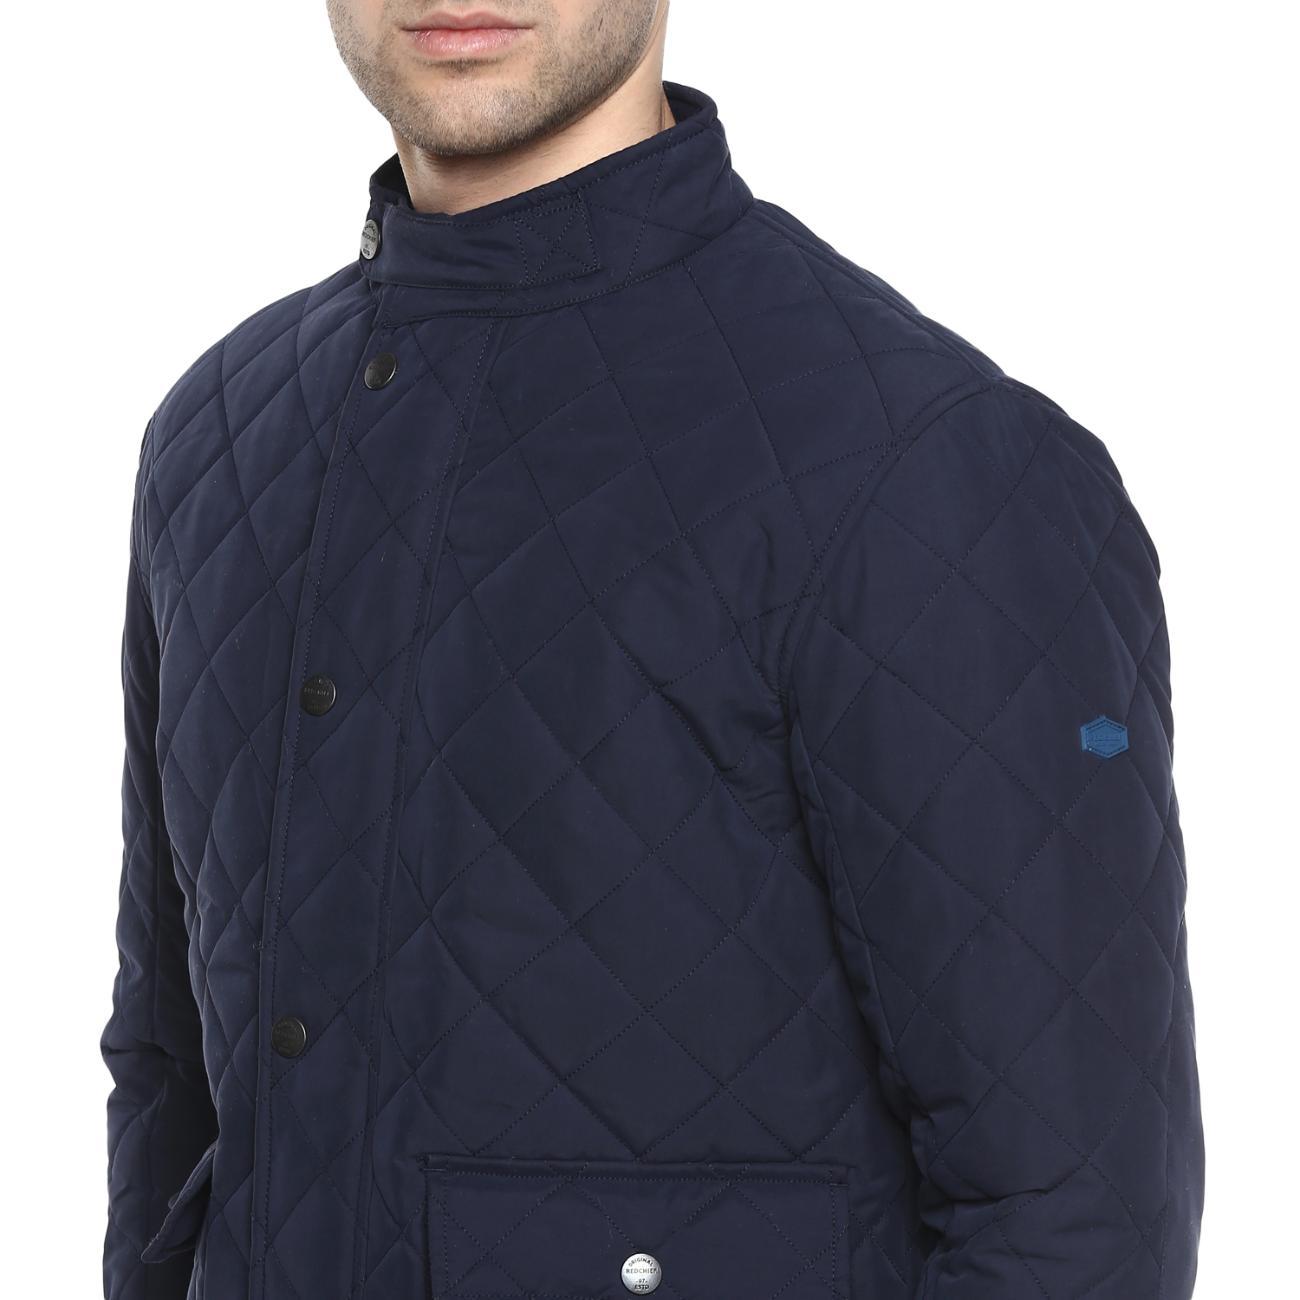 Purchase D. Navy Jacket for Men